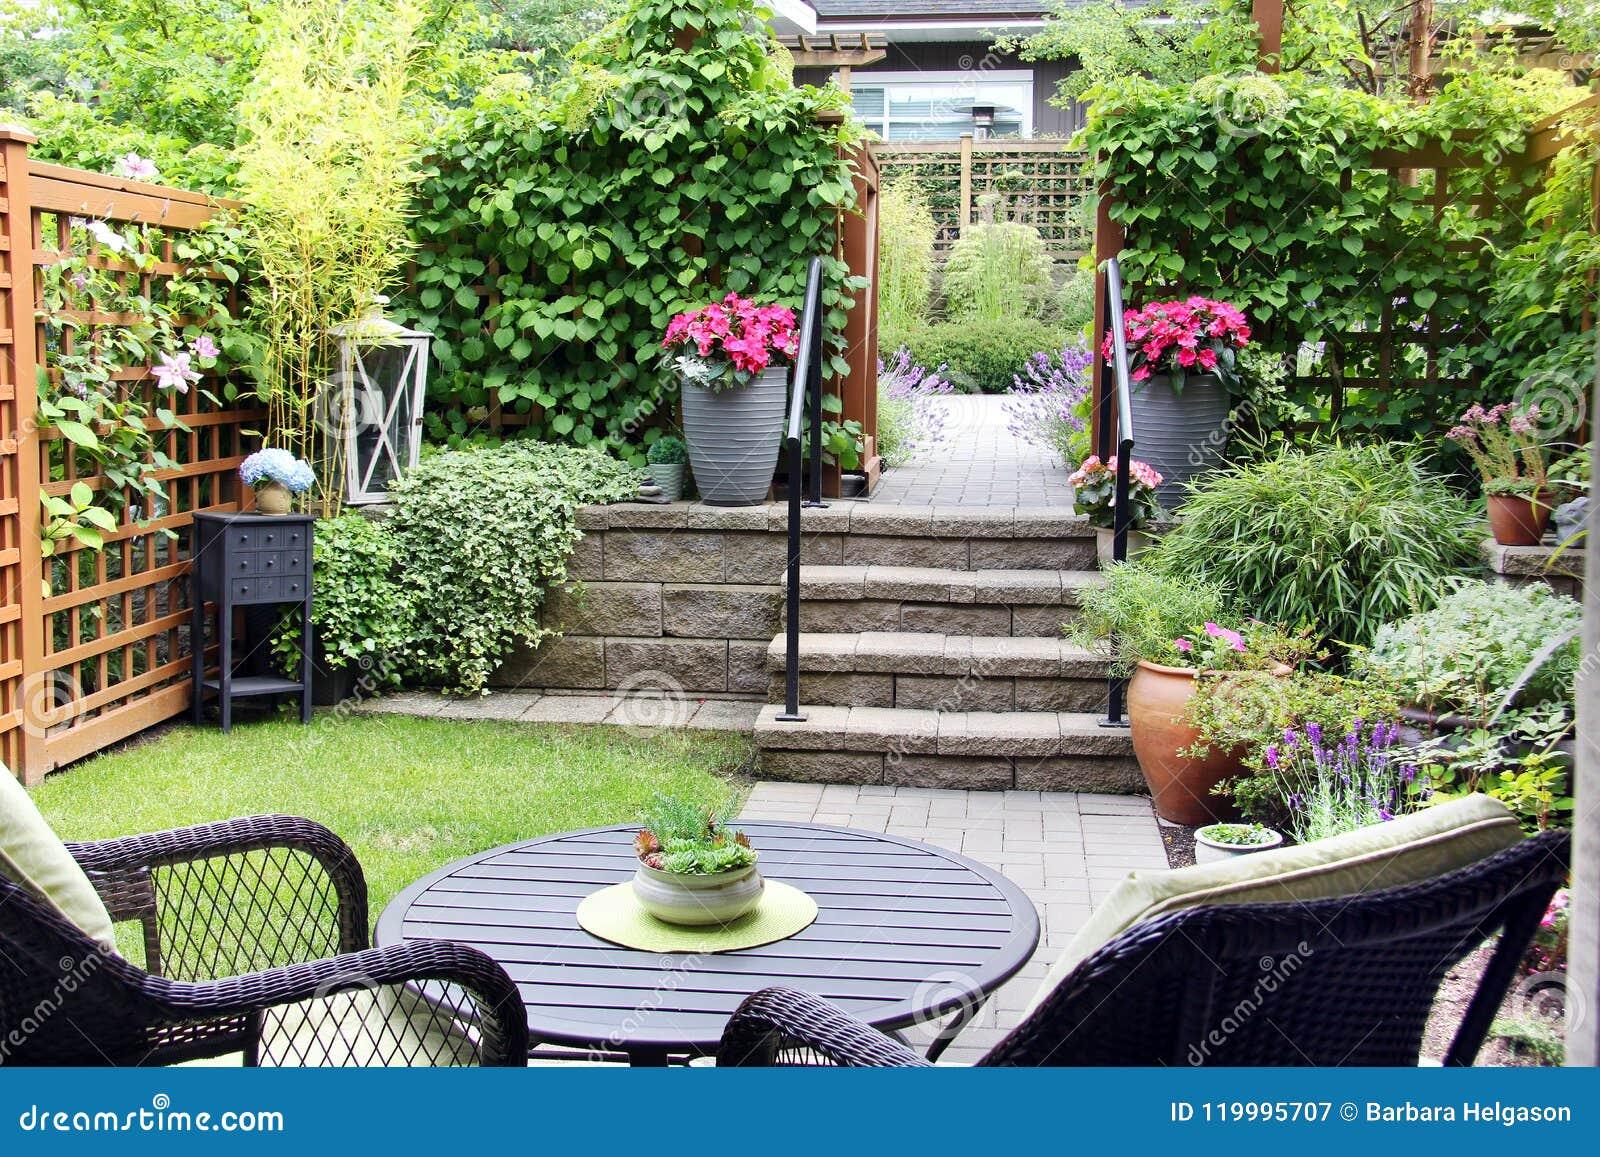 Petit Jardin De Maison Urbaine Image stock - Image du nature, beau ...